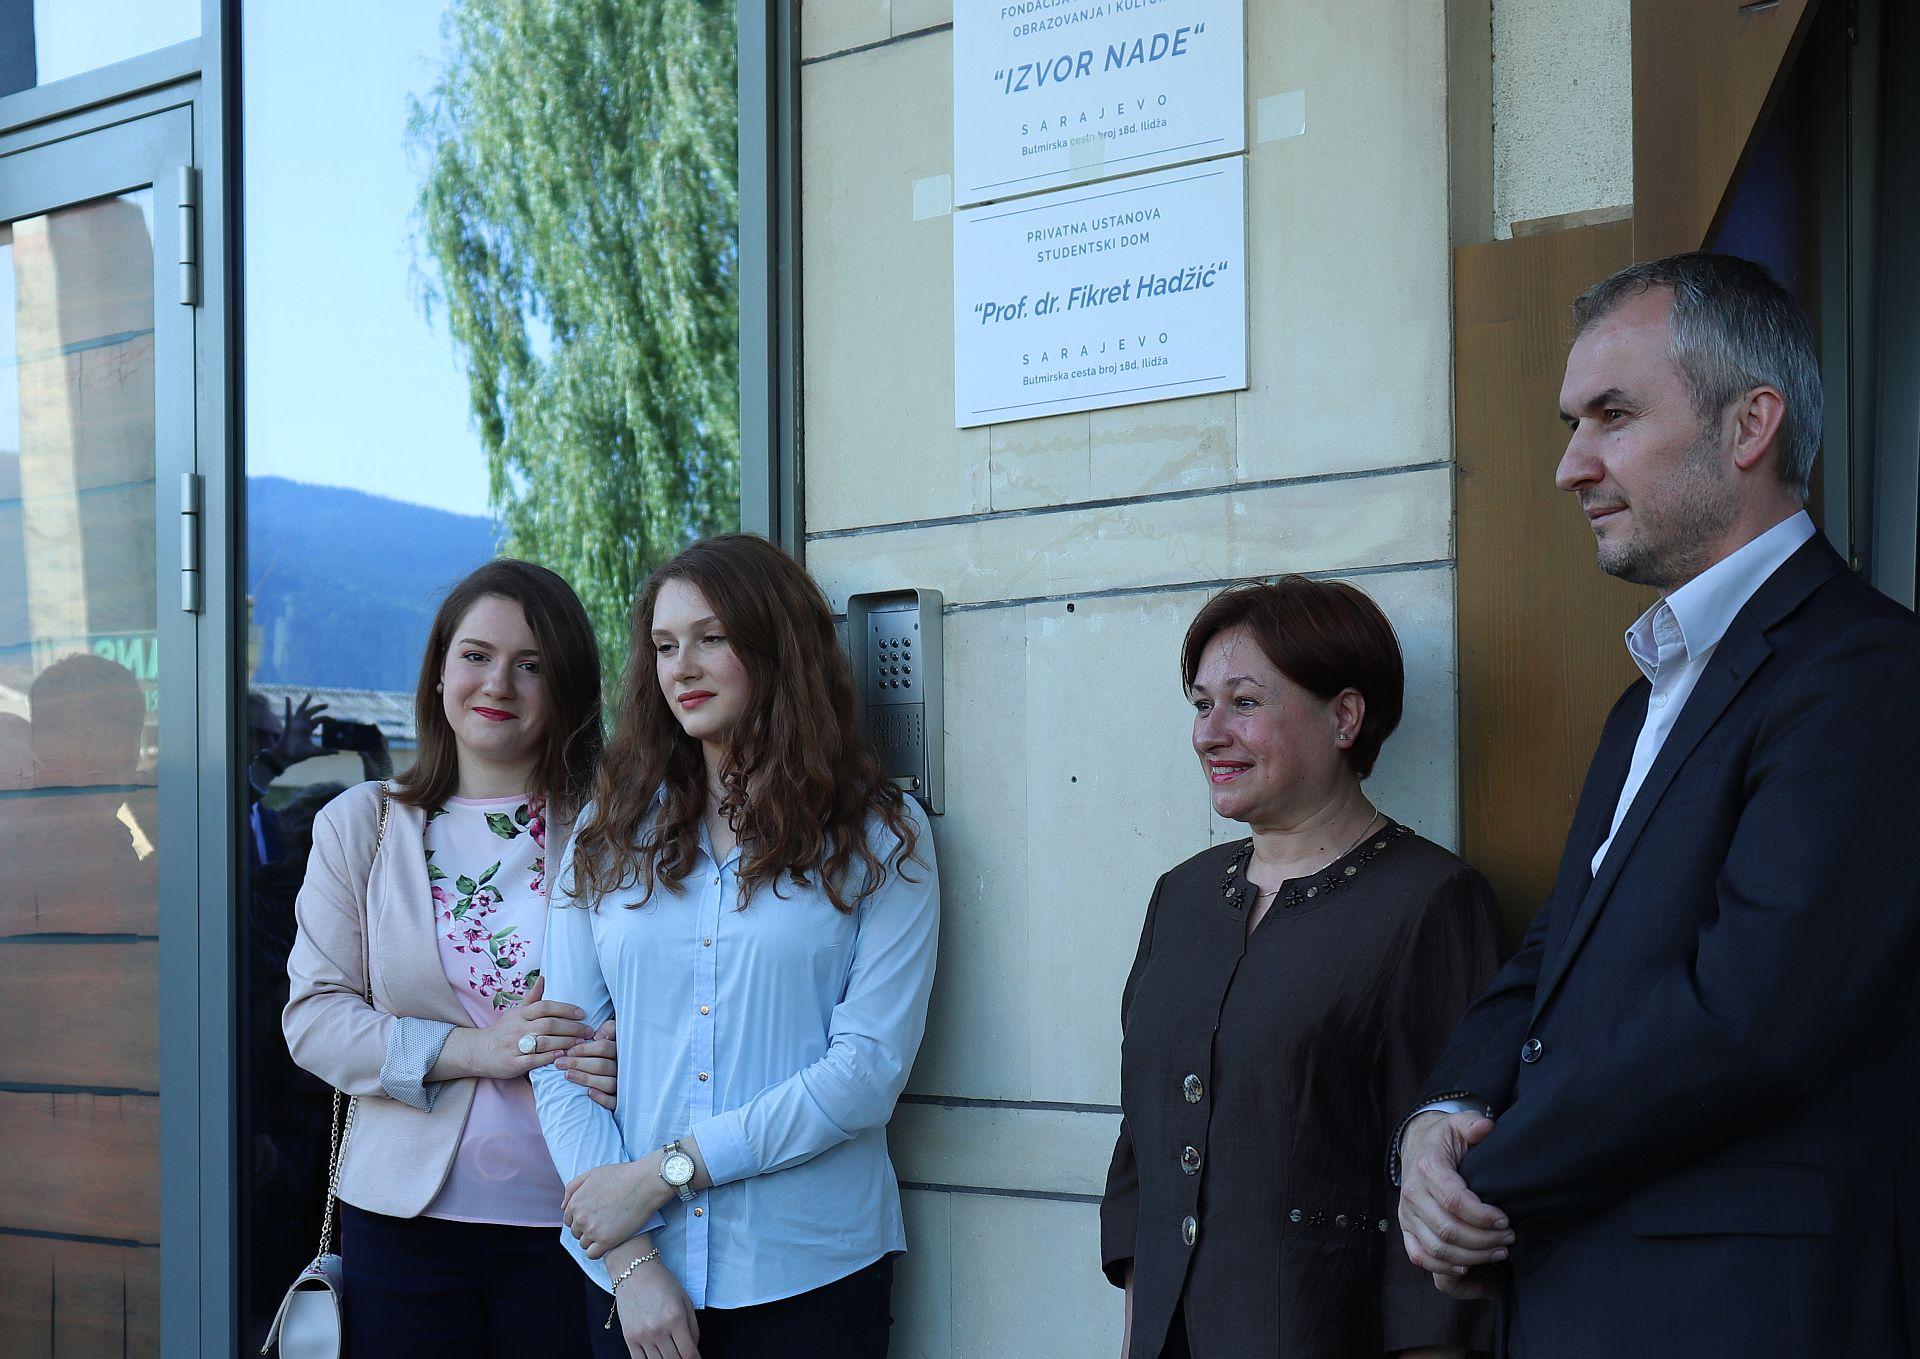 Stud. dom Prof. dr. Fikret Hadzic Sarajevo_c